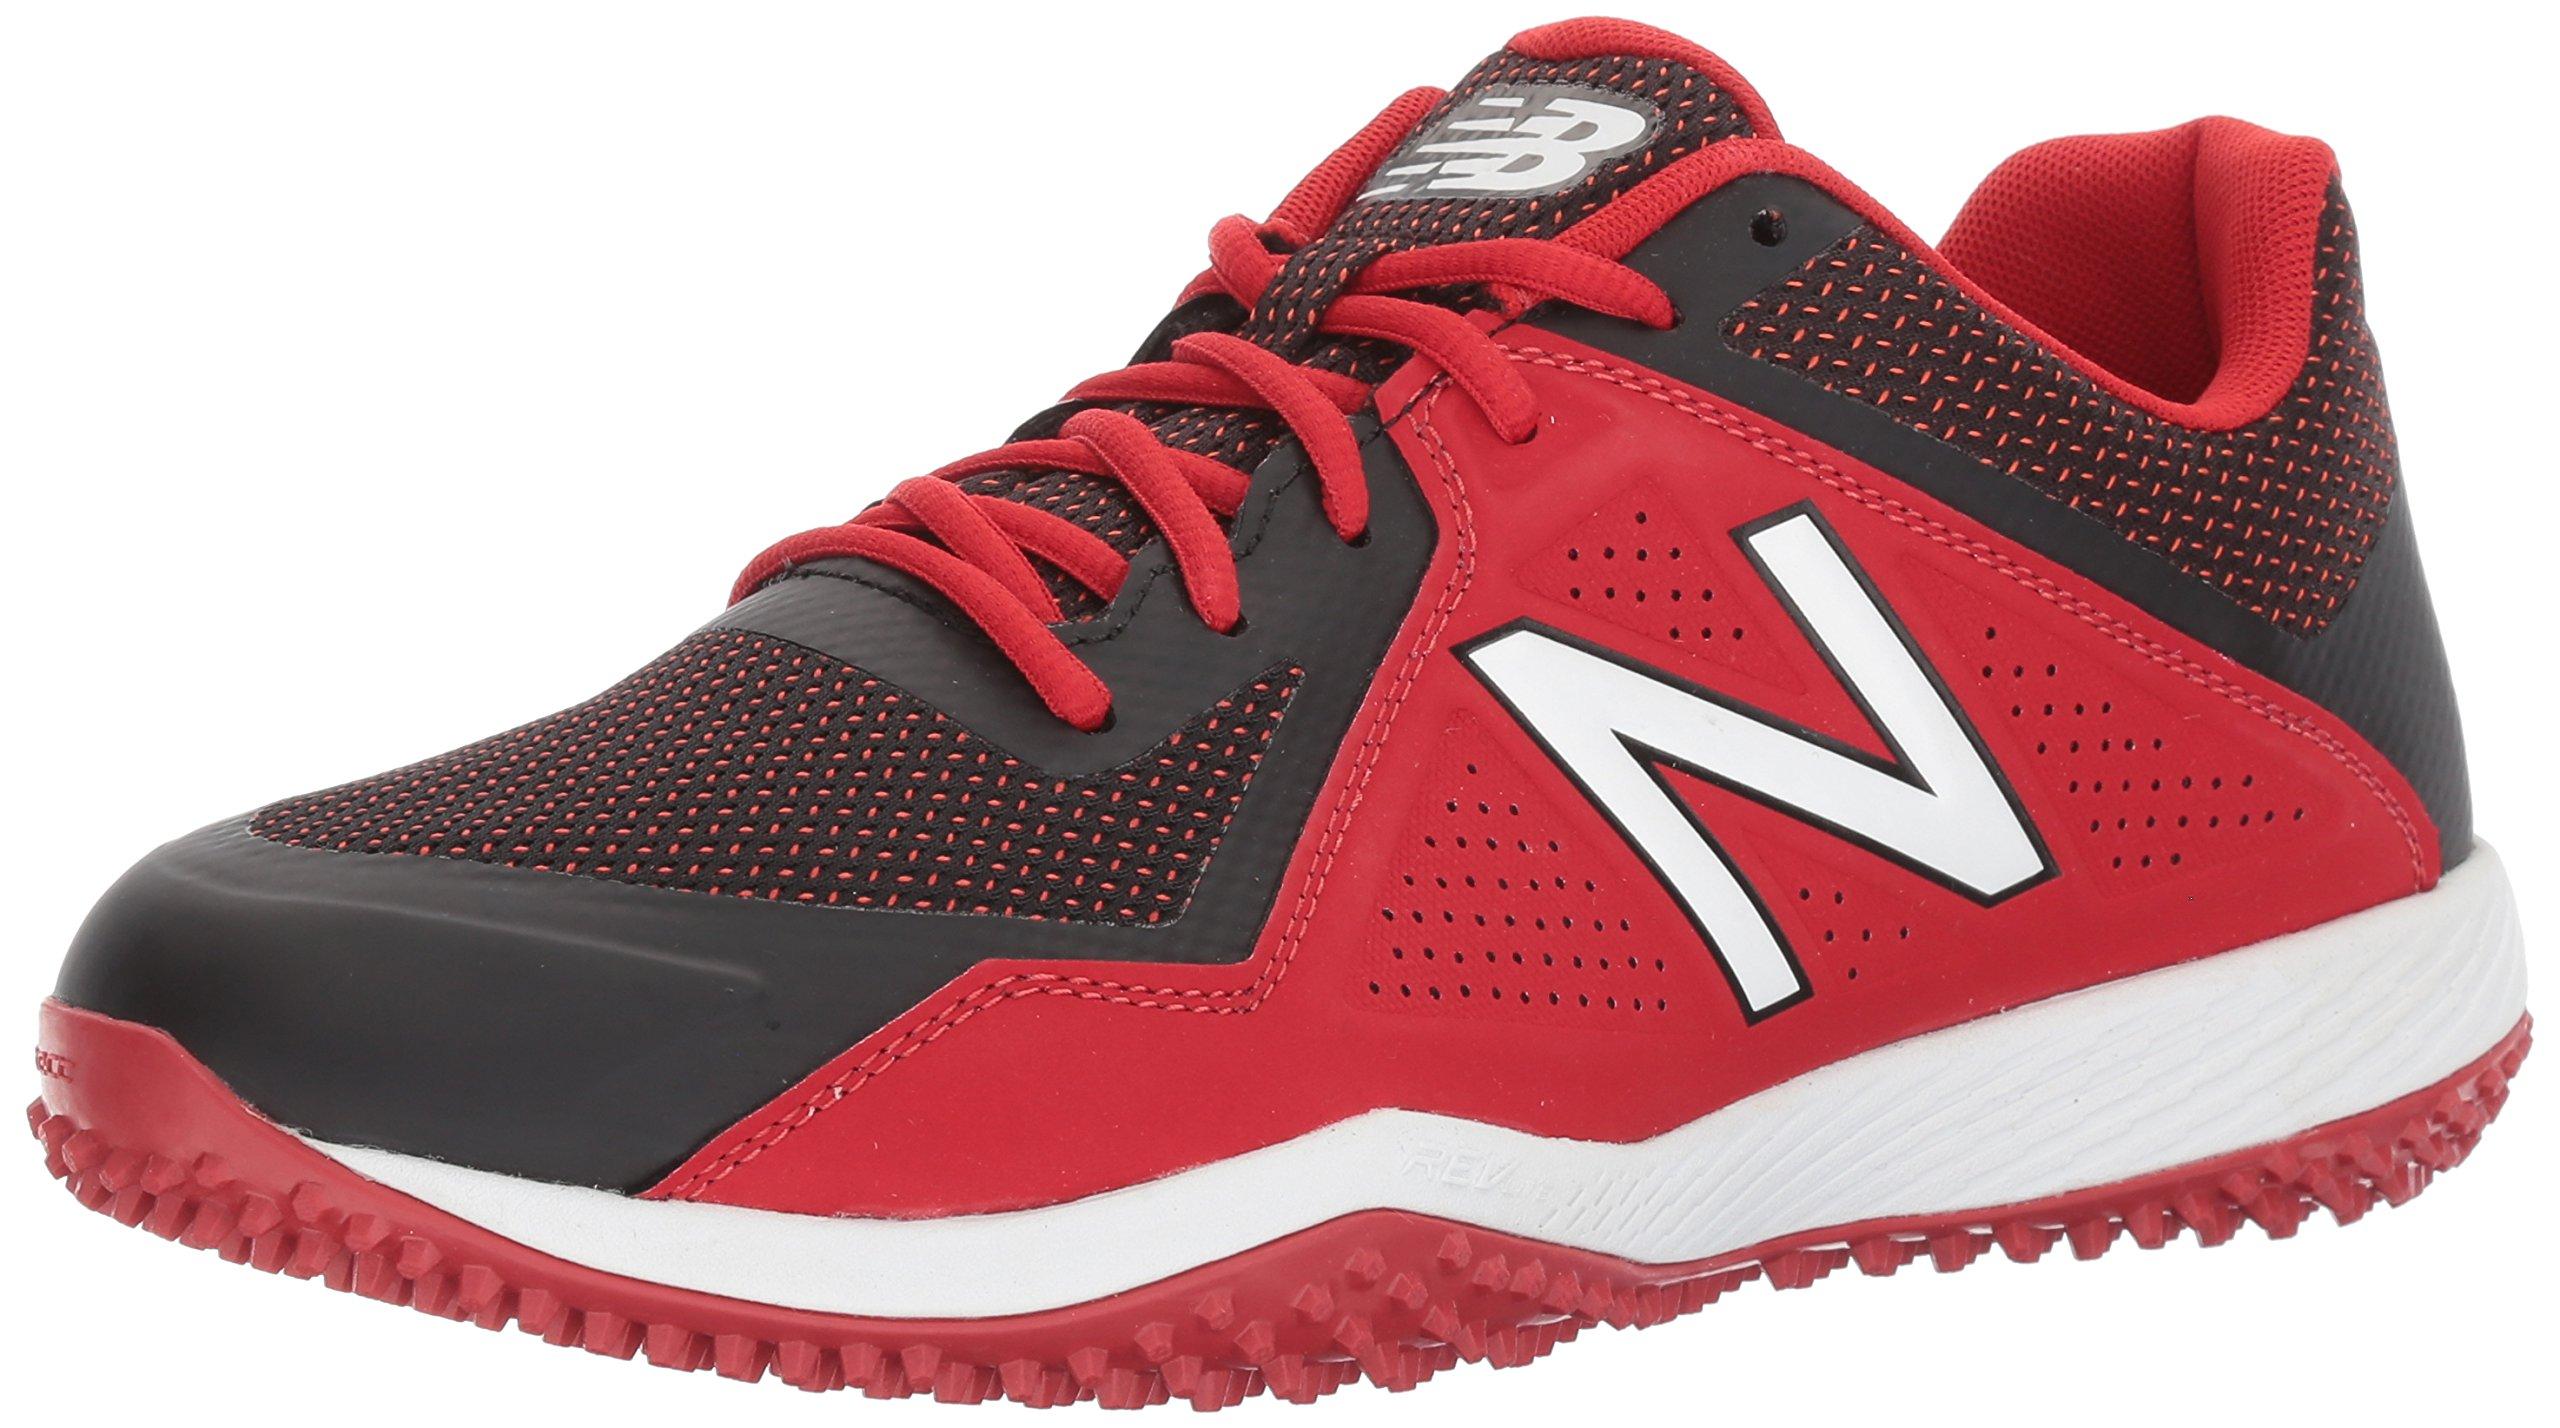 New Balance Men's T4040v4 Turf Baseball Shoe, Black/Red, 5.5 2E US by New Balance